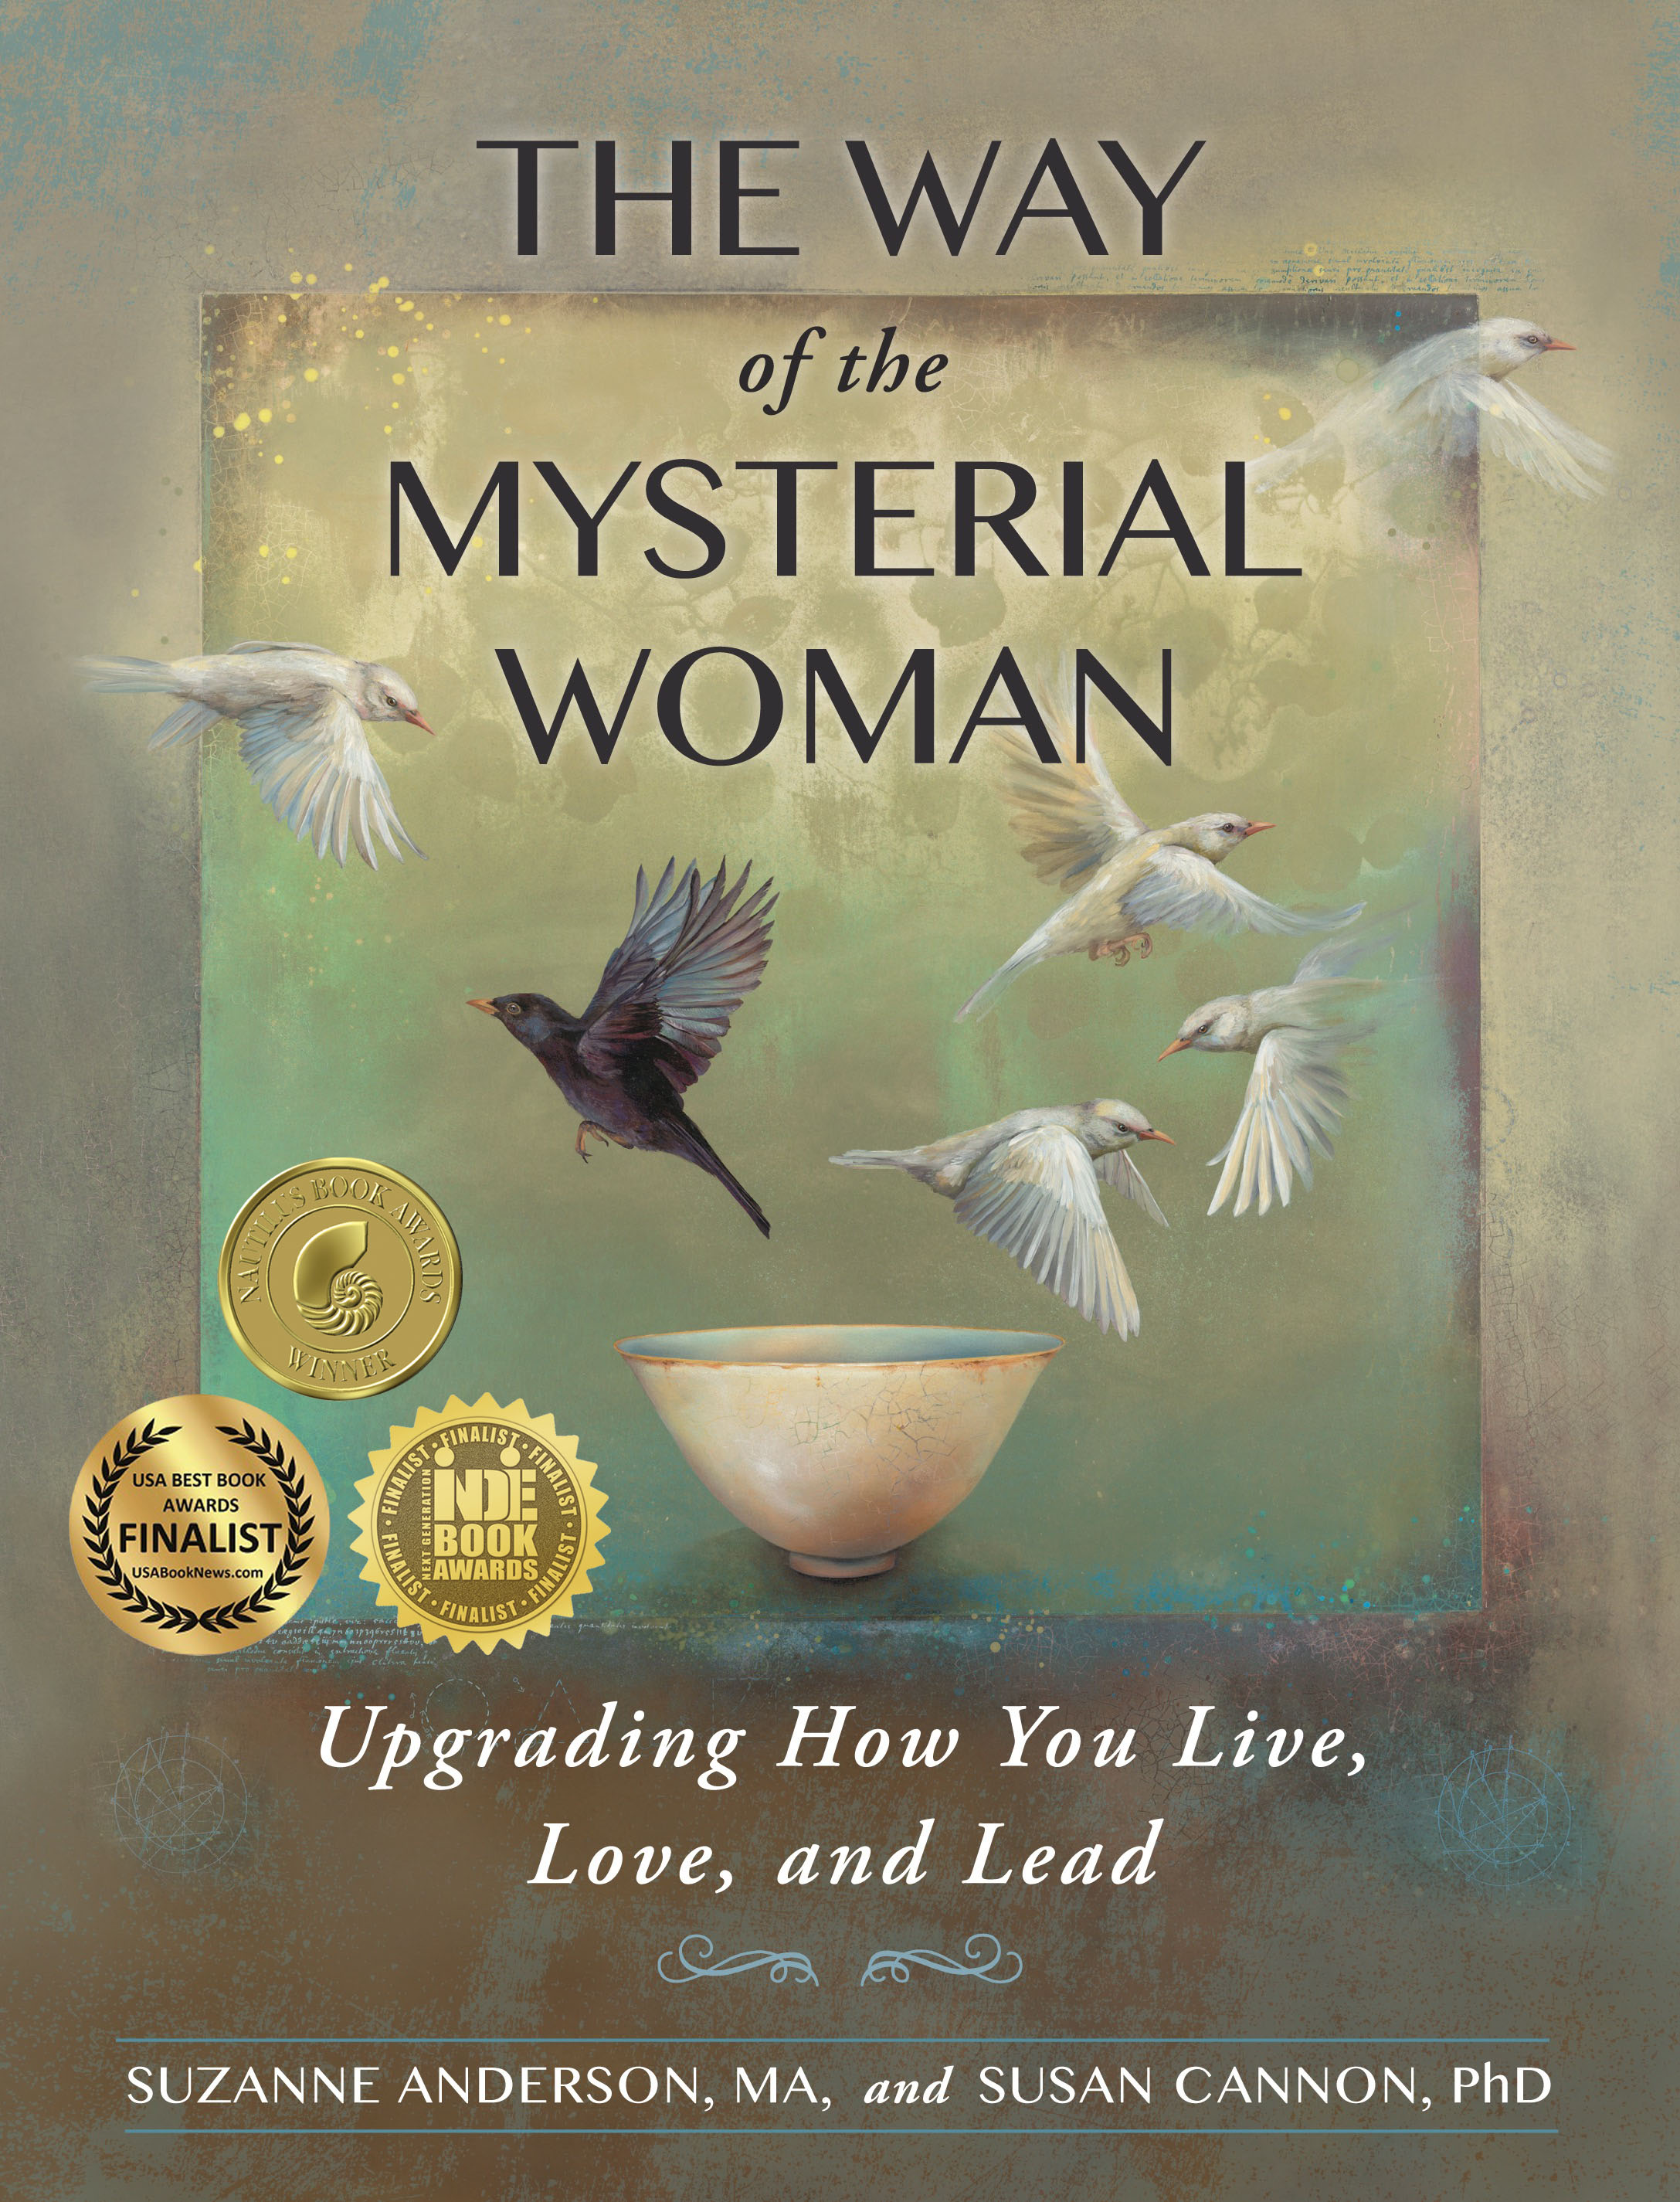 mysterial-woman-cover-awards.jpg